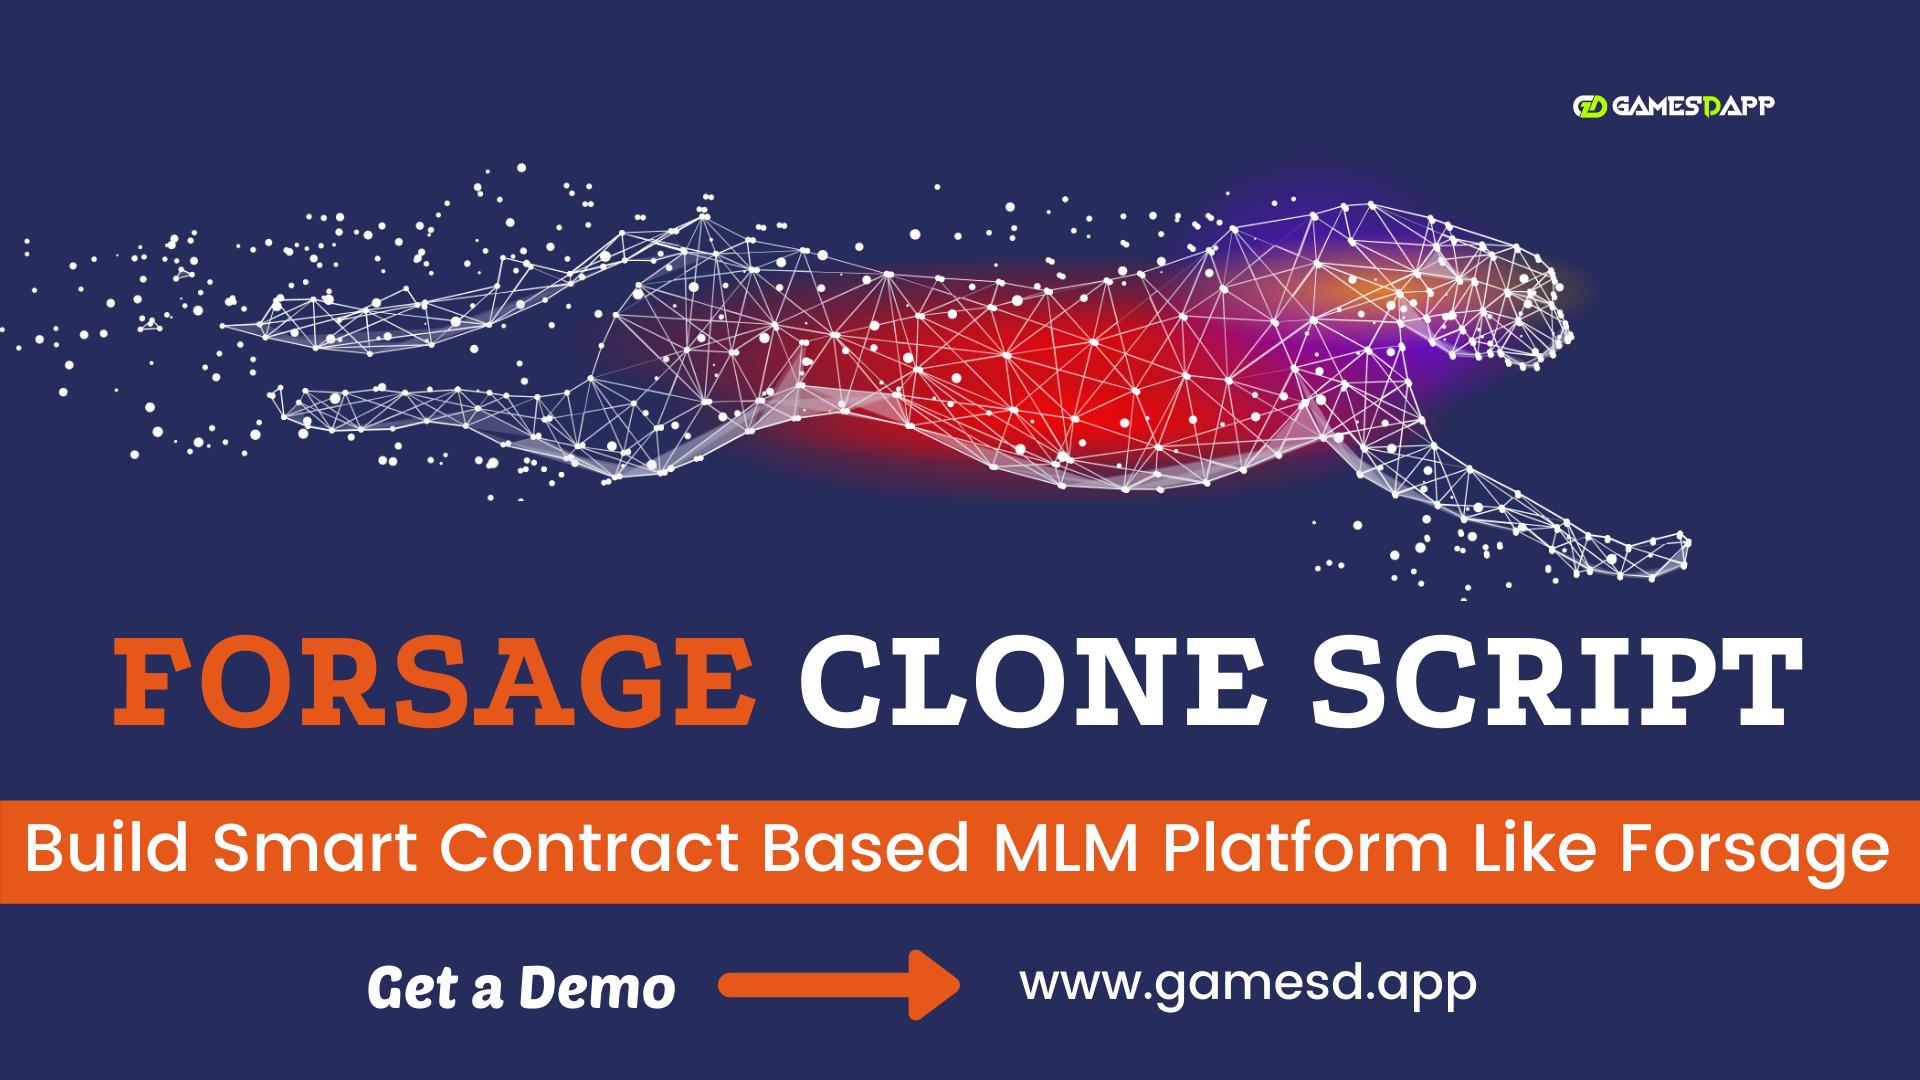 Build Smart Contract Based MLM Platform Like Forsage